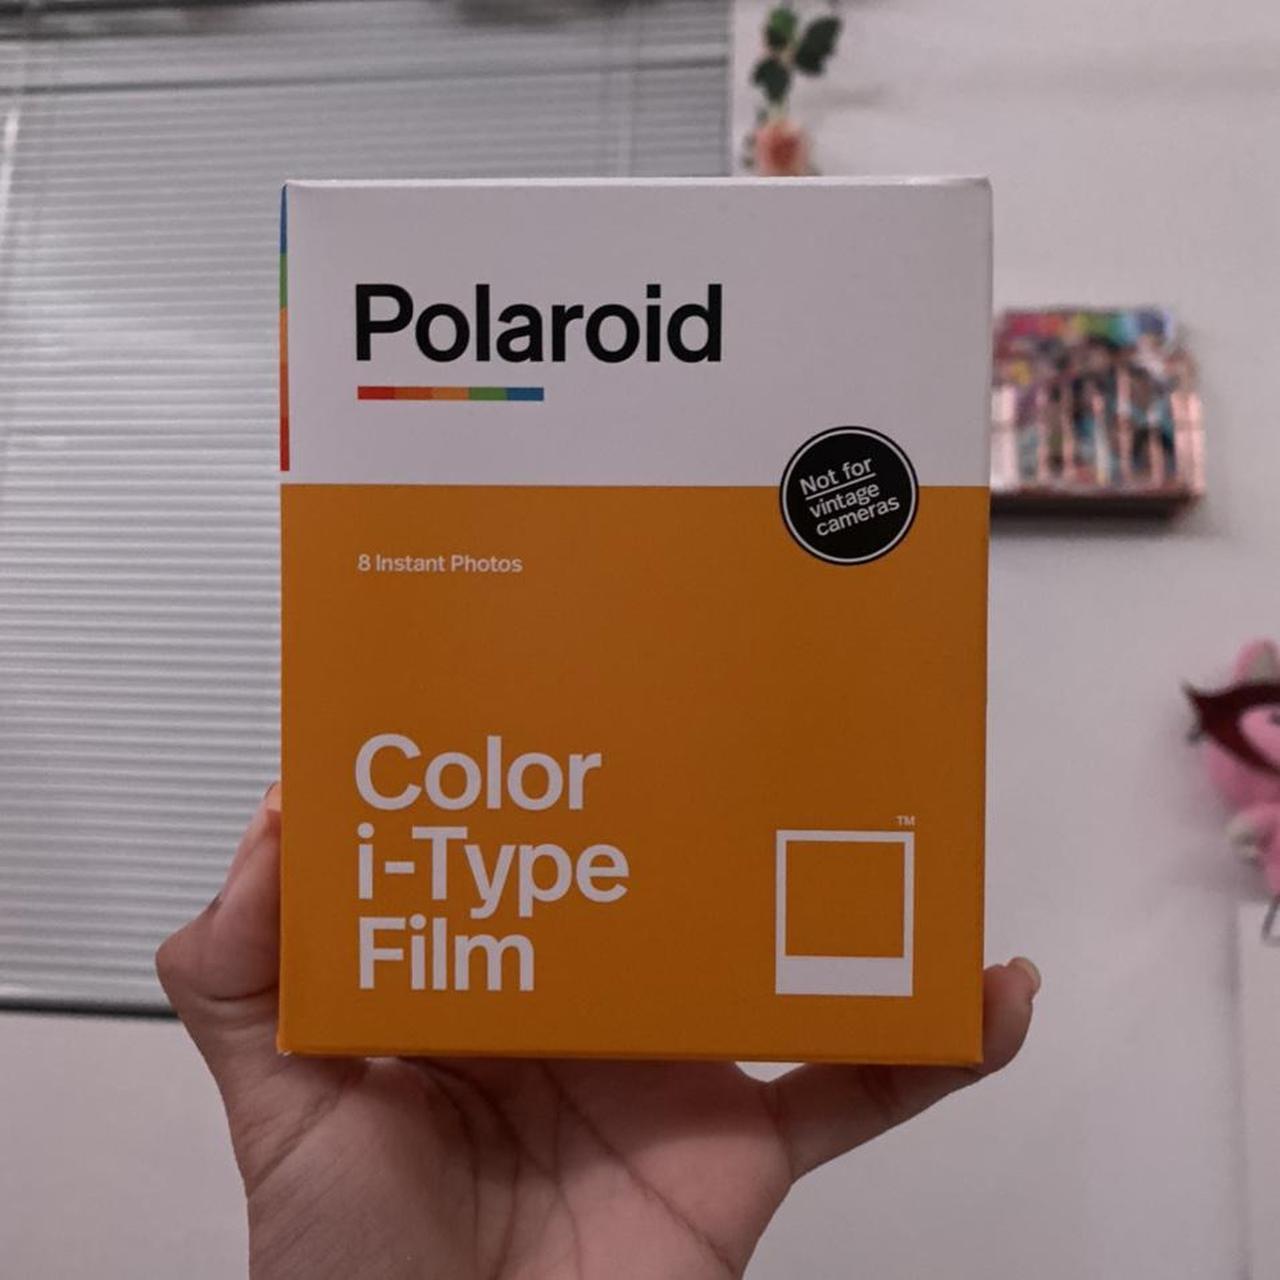 Product Image 1 - Polaroid Color i-Type Film -